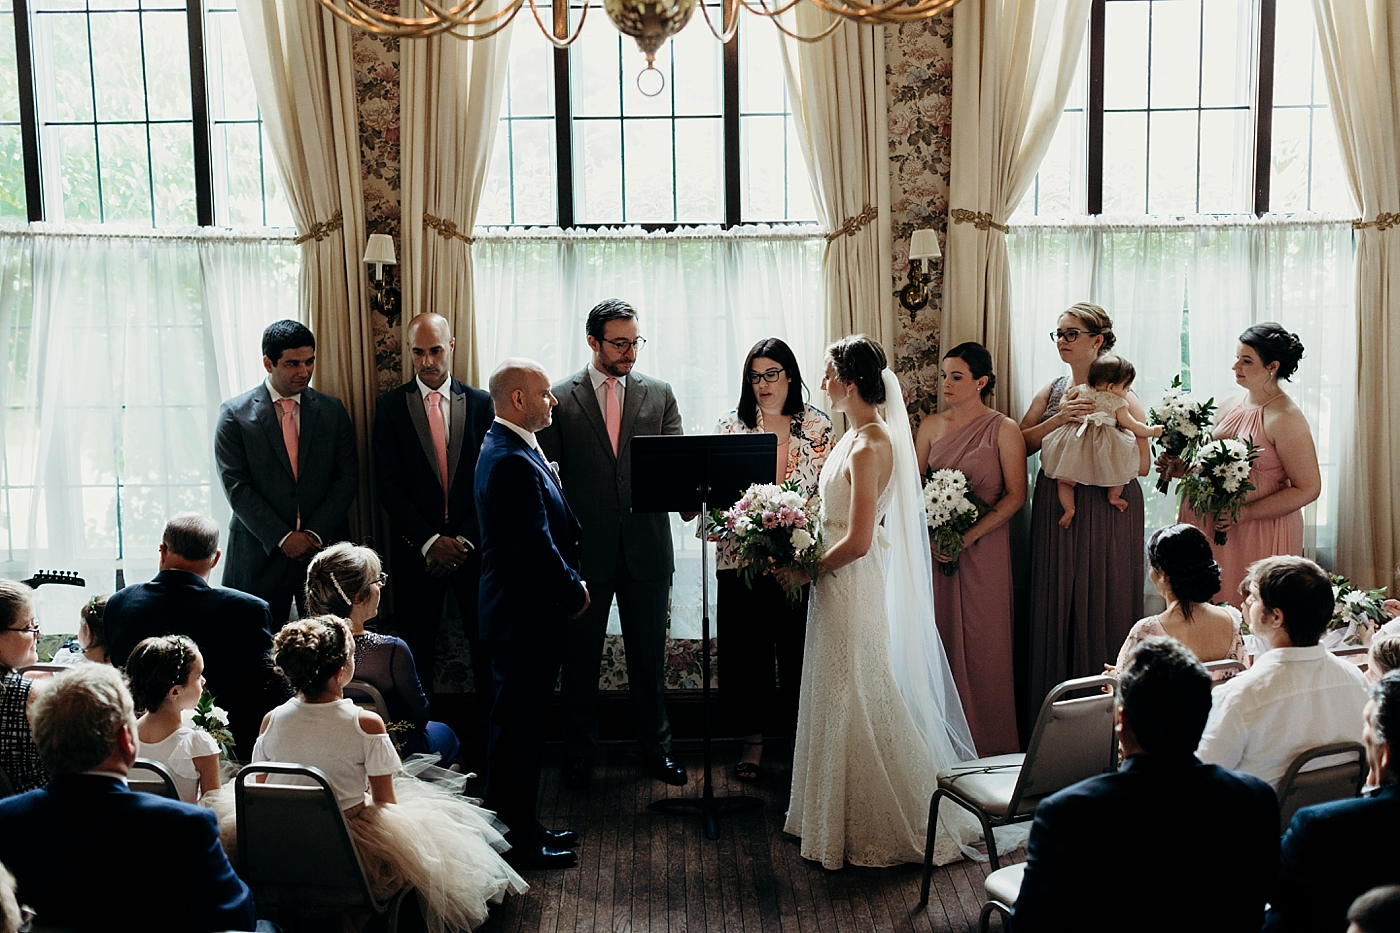 Chateau-Michelle-Wedding-Julia+JuanLuis_TheHeartlandersCo2018LA-255.jpg